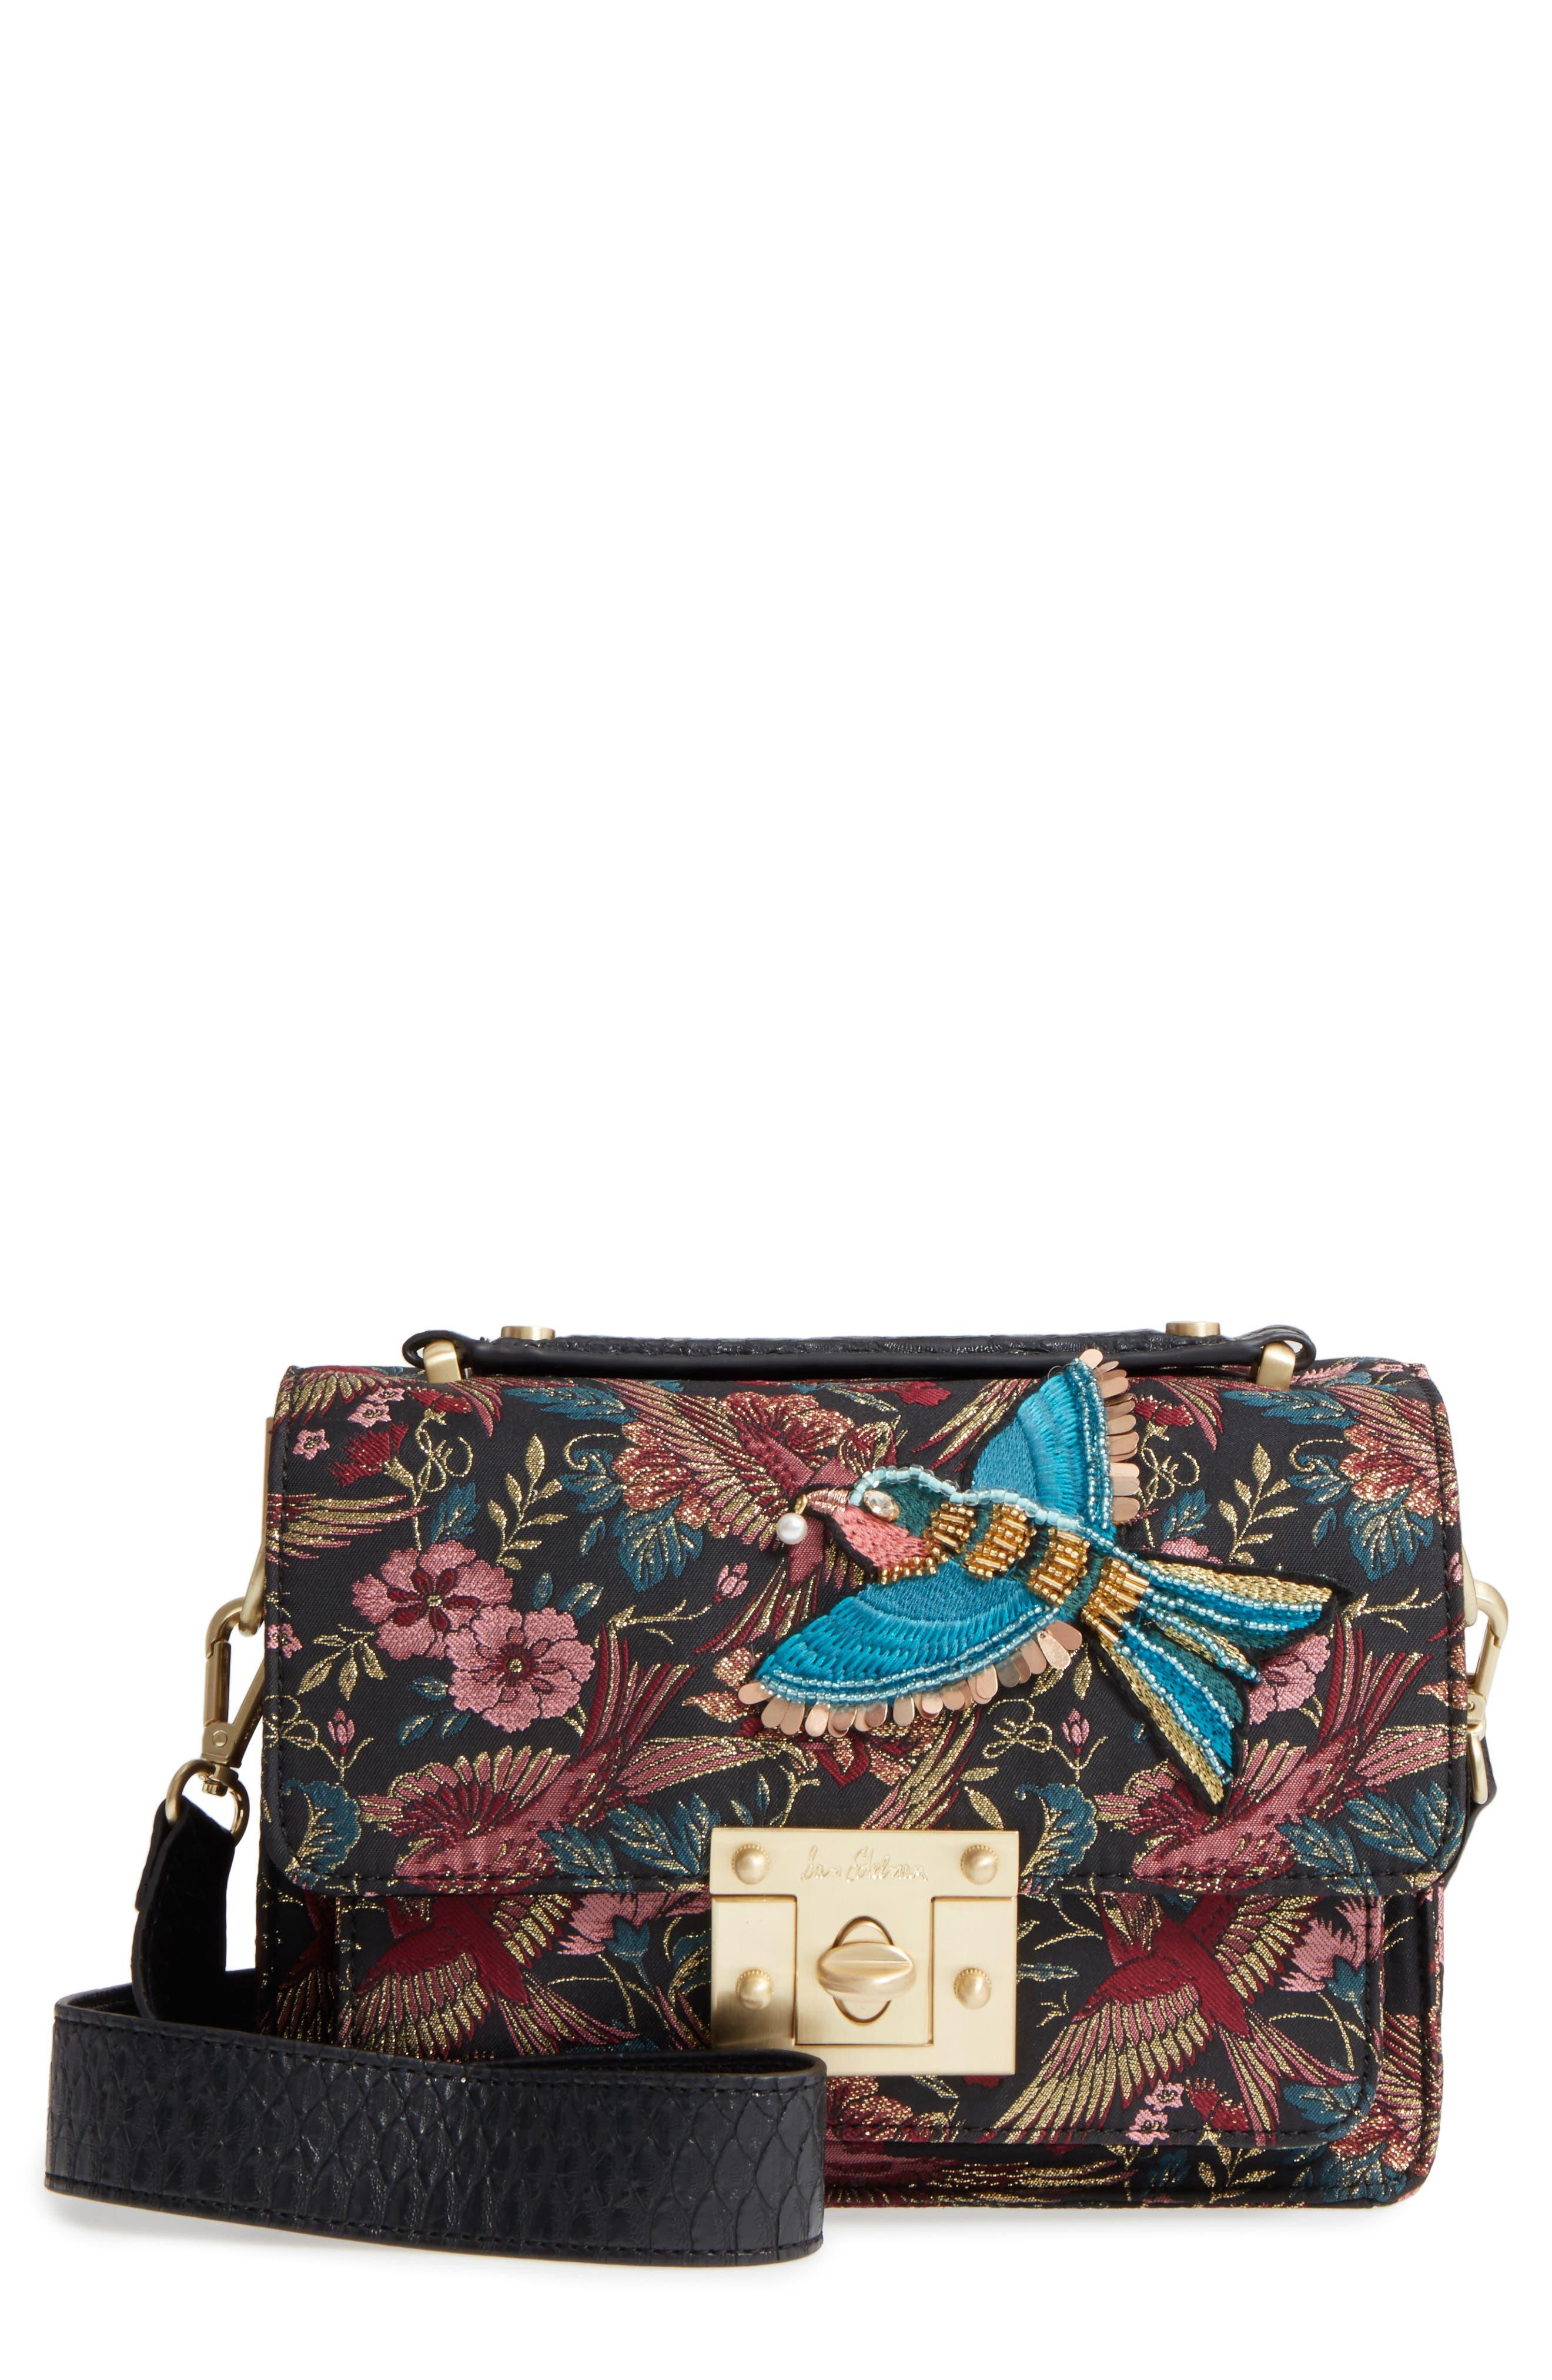 Alternate Image 1 Selected - Sam Edelman Gessica Jacquard Shoulder Bag